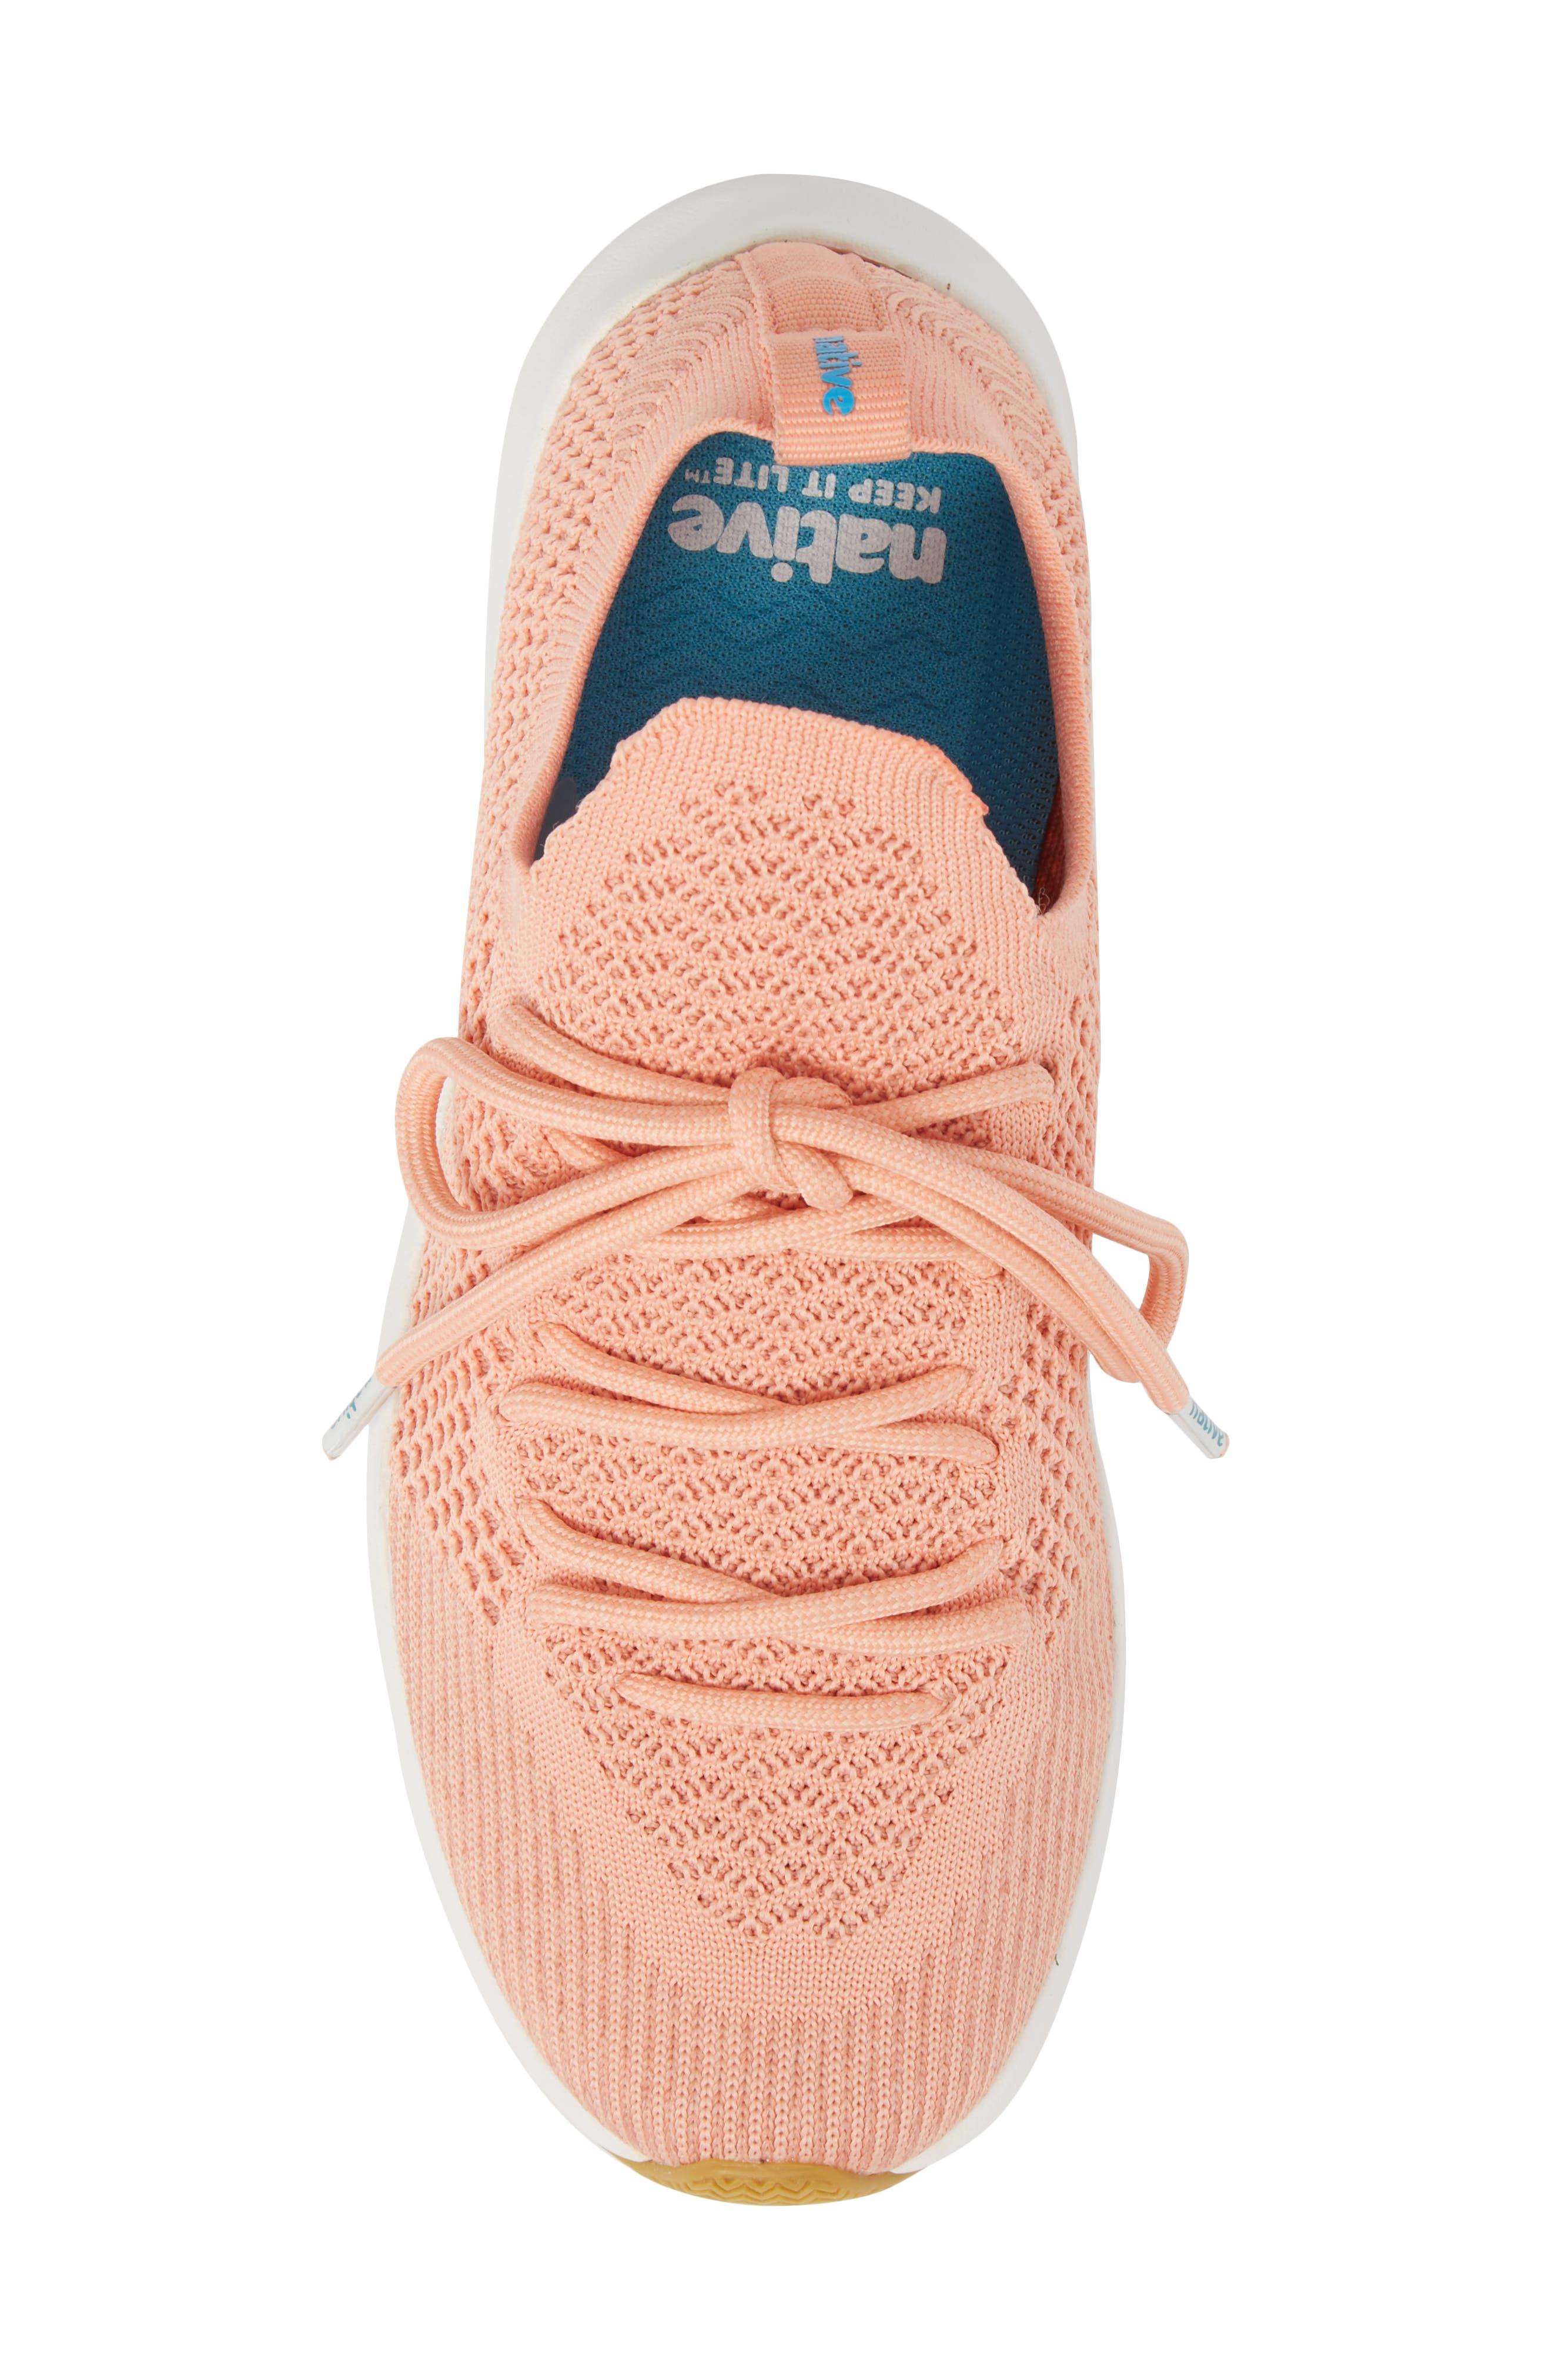 AP Mercury Liteknit Sneaker,                             Alternate thumbnail 5, color,                             Clay Pink/ Shell White